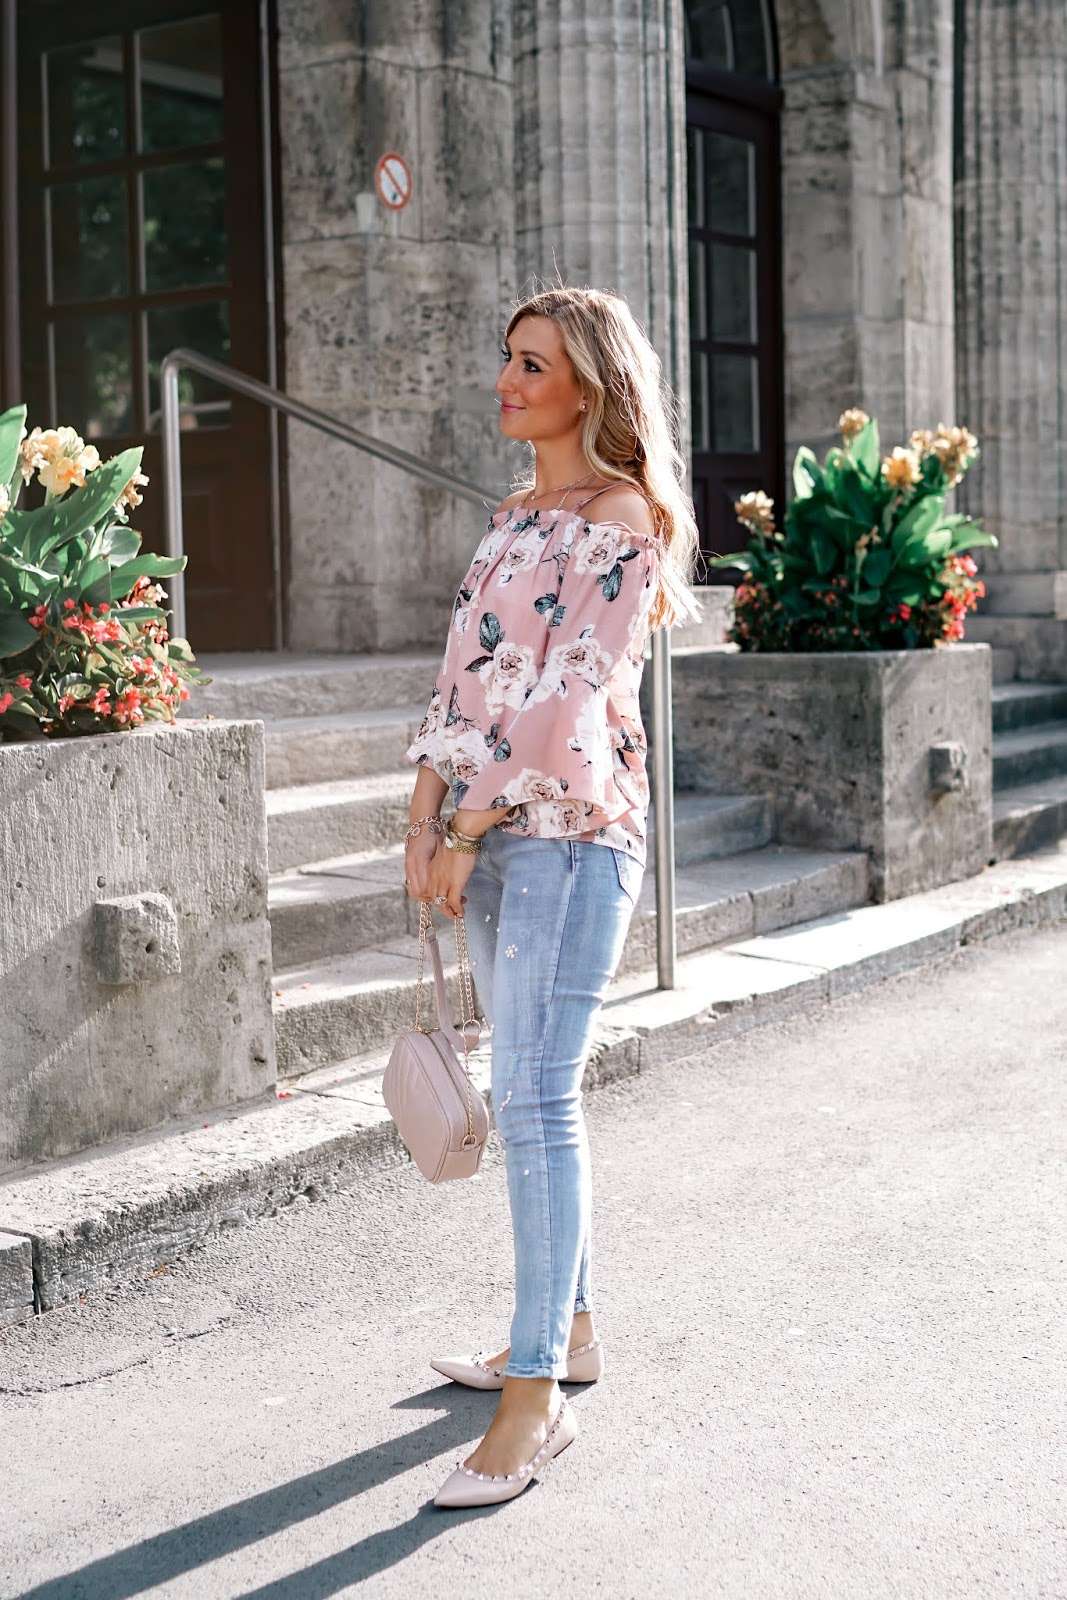 cold-shoulder-top-puderrosa-Offshoulder-jeans-mit-perlen-perlen Jeanshose-bloggerstyle-herbst-Outfit-jeanshose-helle-jeans-hose-Fashionblogger-fashionstylebyjohanna.